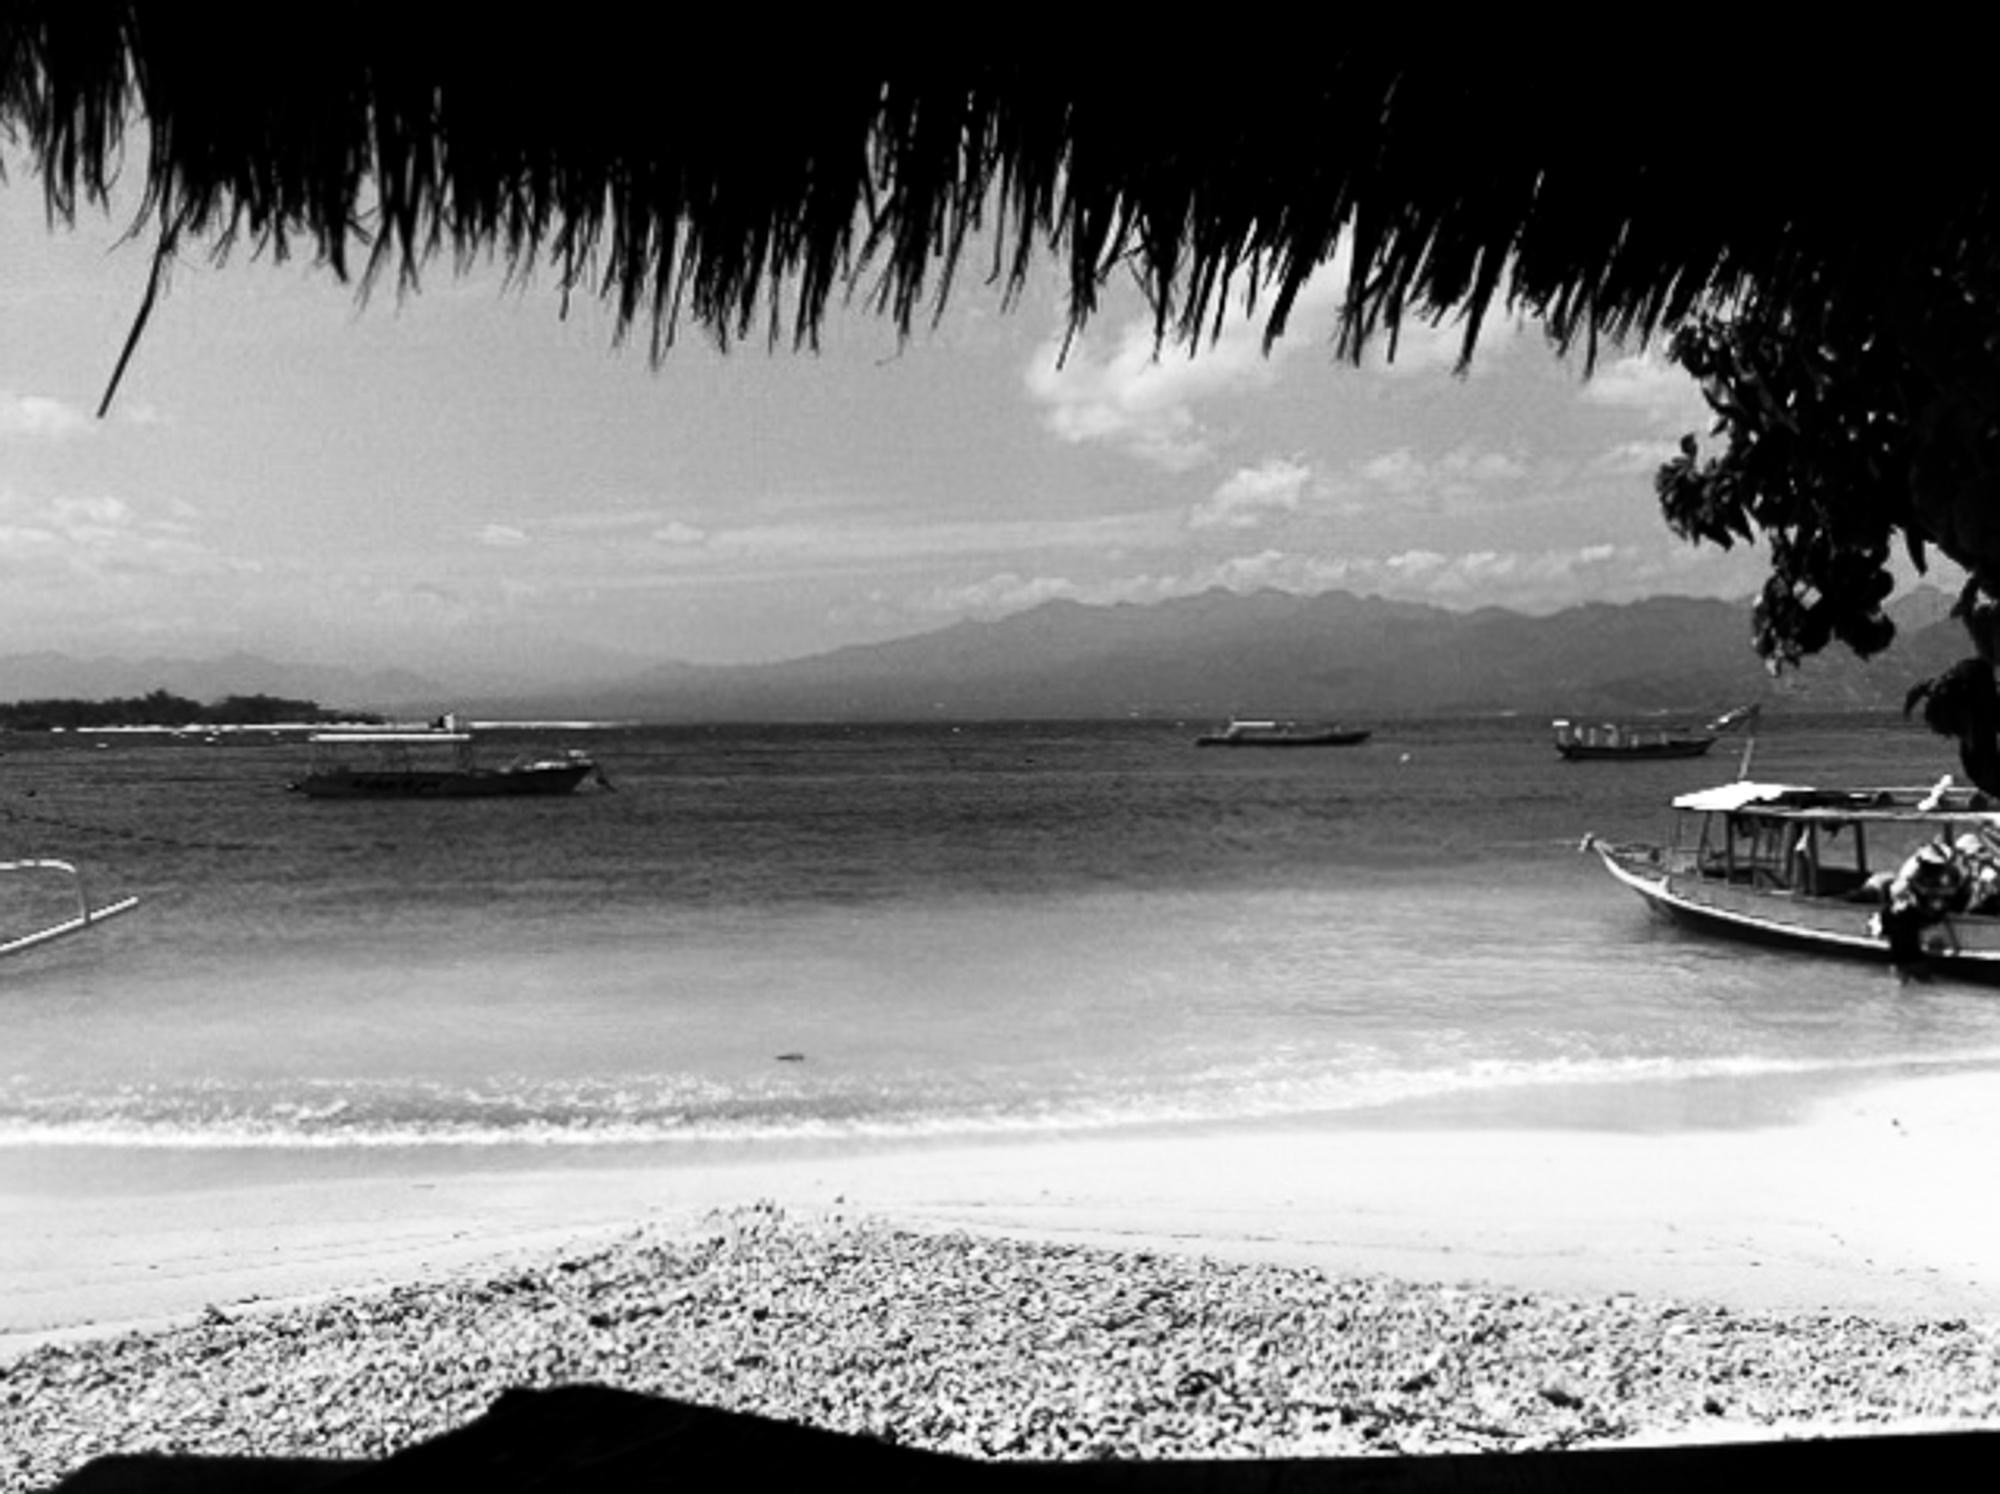 The beach at Gili Trawangan on Lombok, Indonesia - Bali Street Photographer